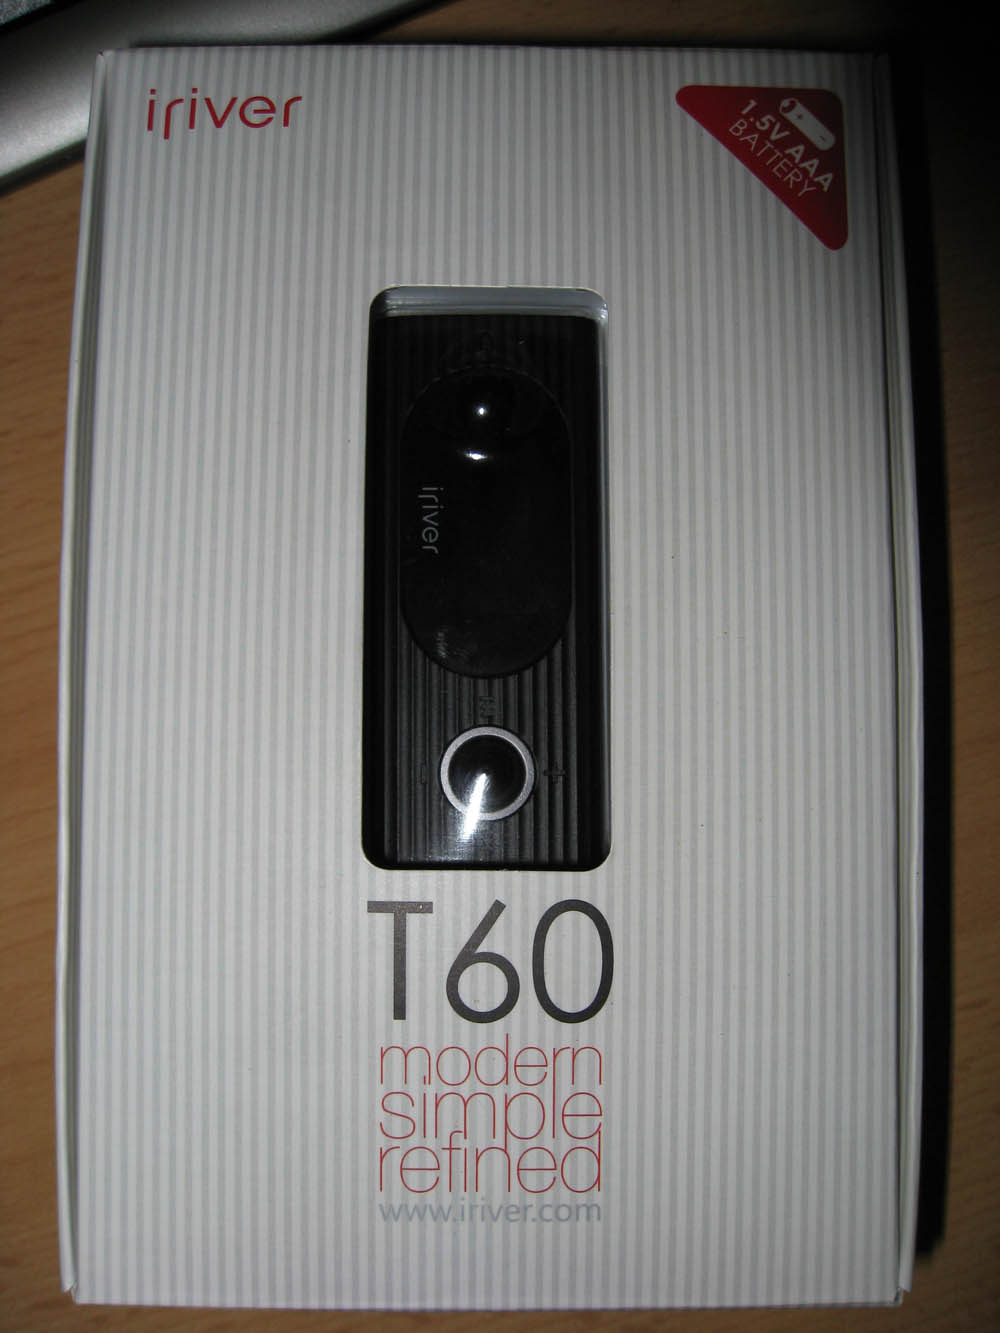 iRiver-T60-krabicka.JPG